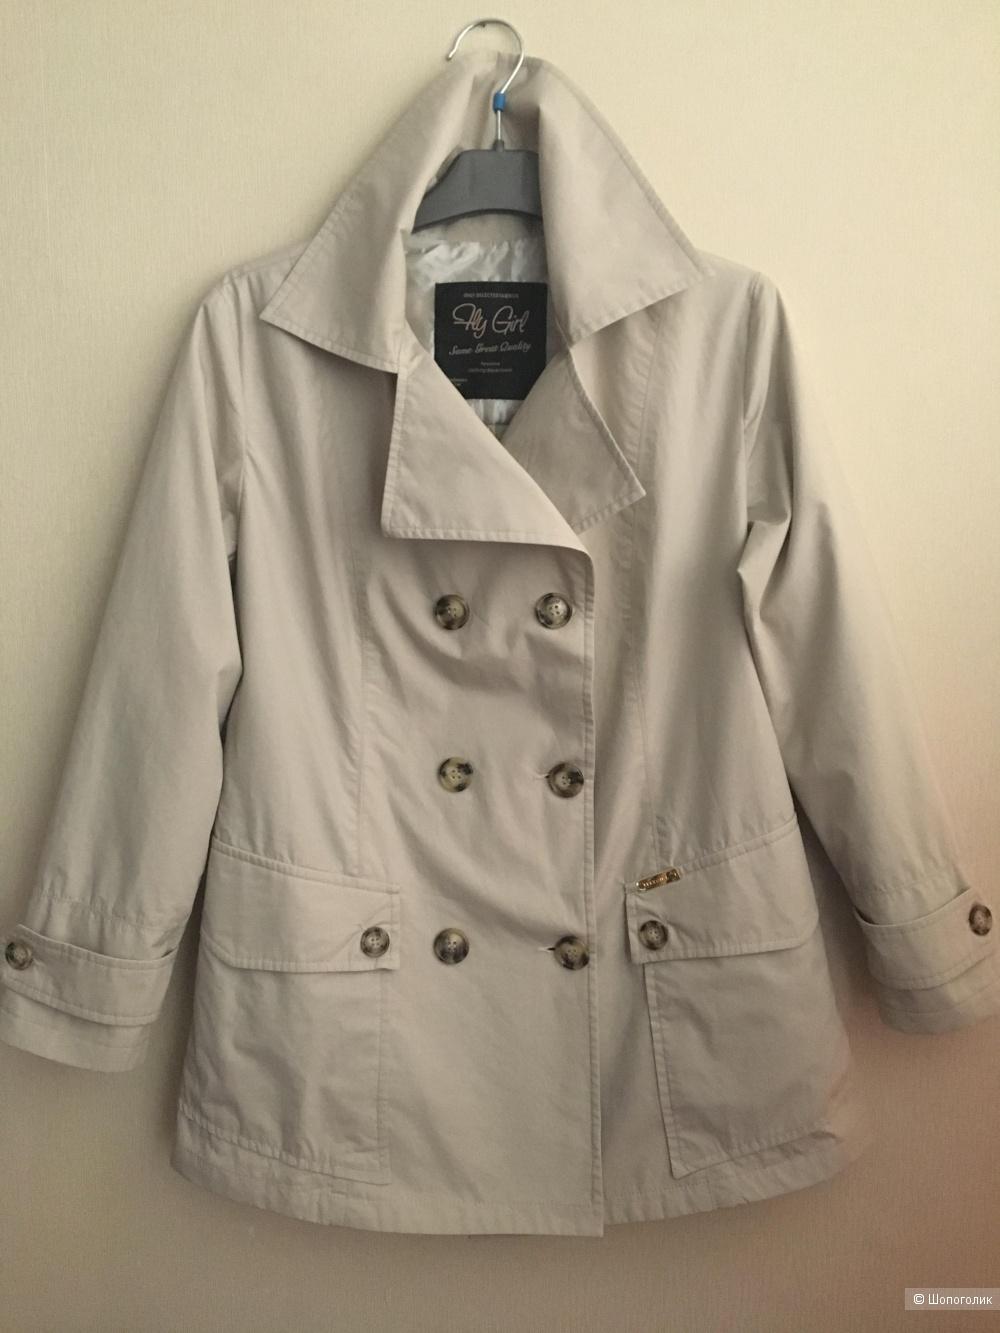 Куртка-ветровка Fly Girl,размер М